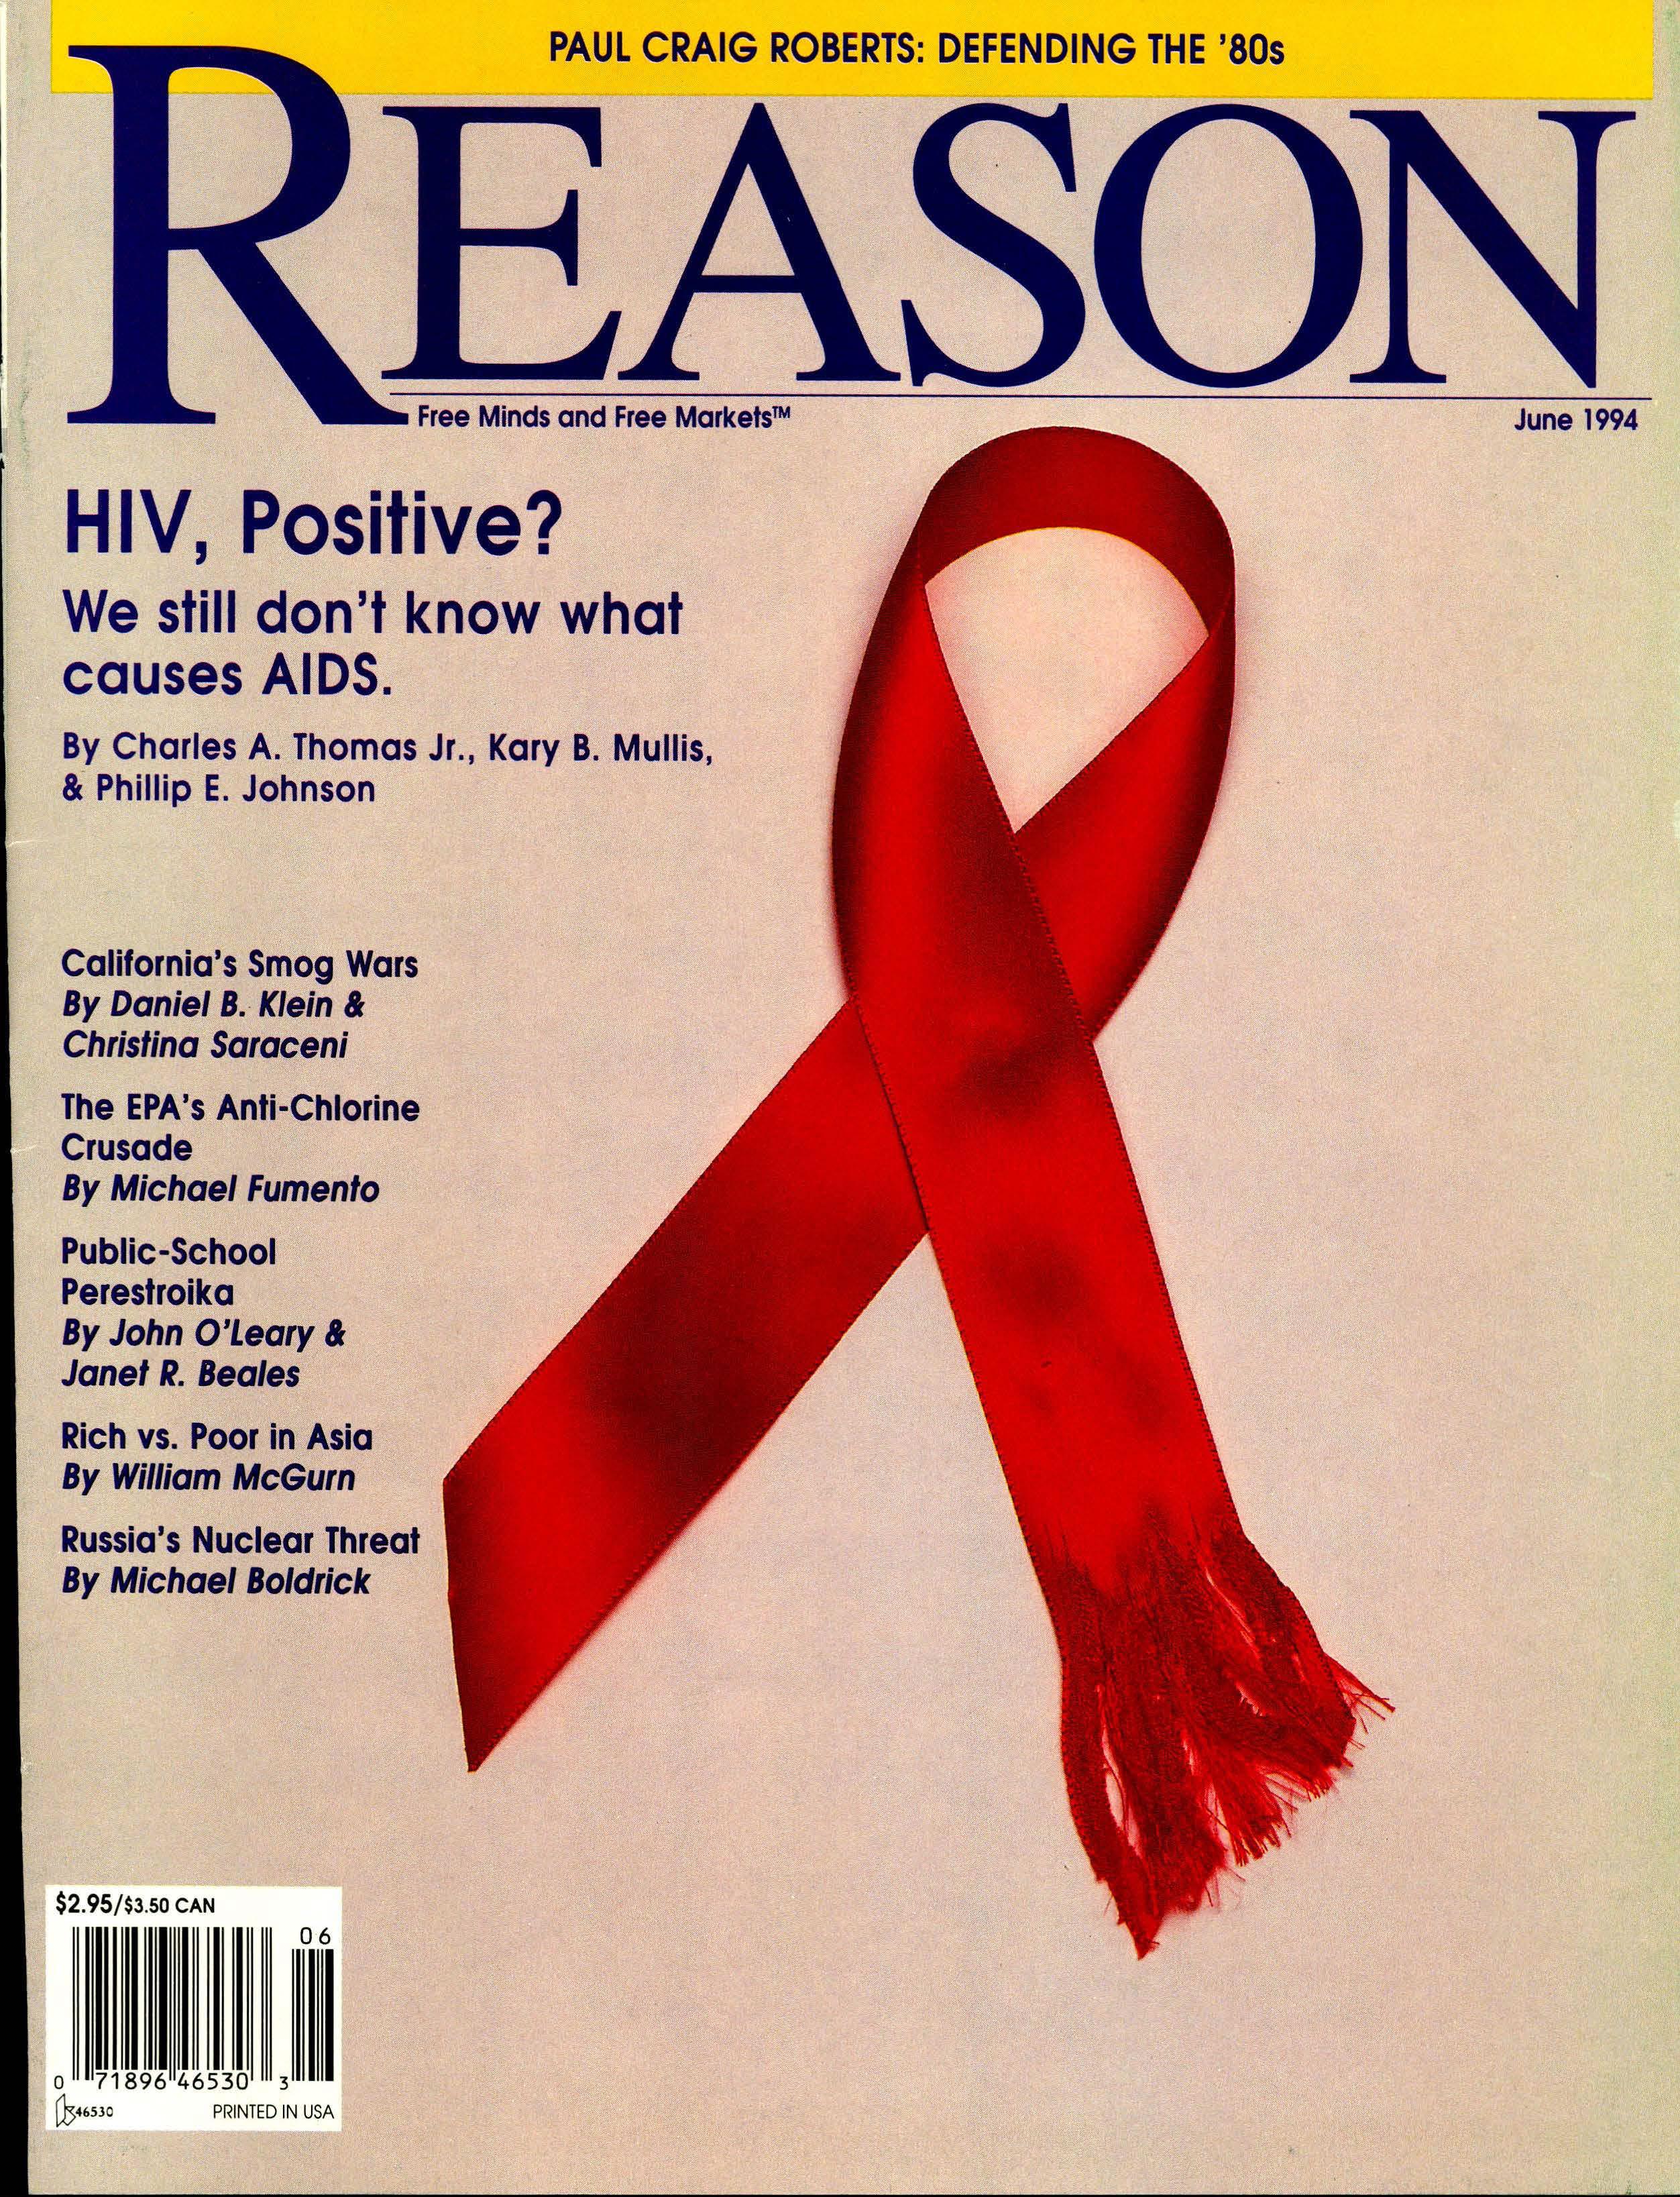 Reason Magazine, June 1994 cover image